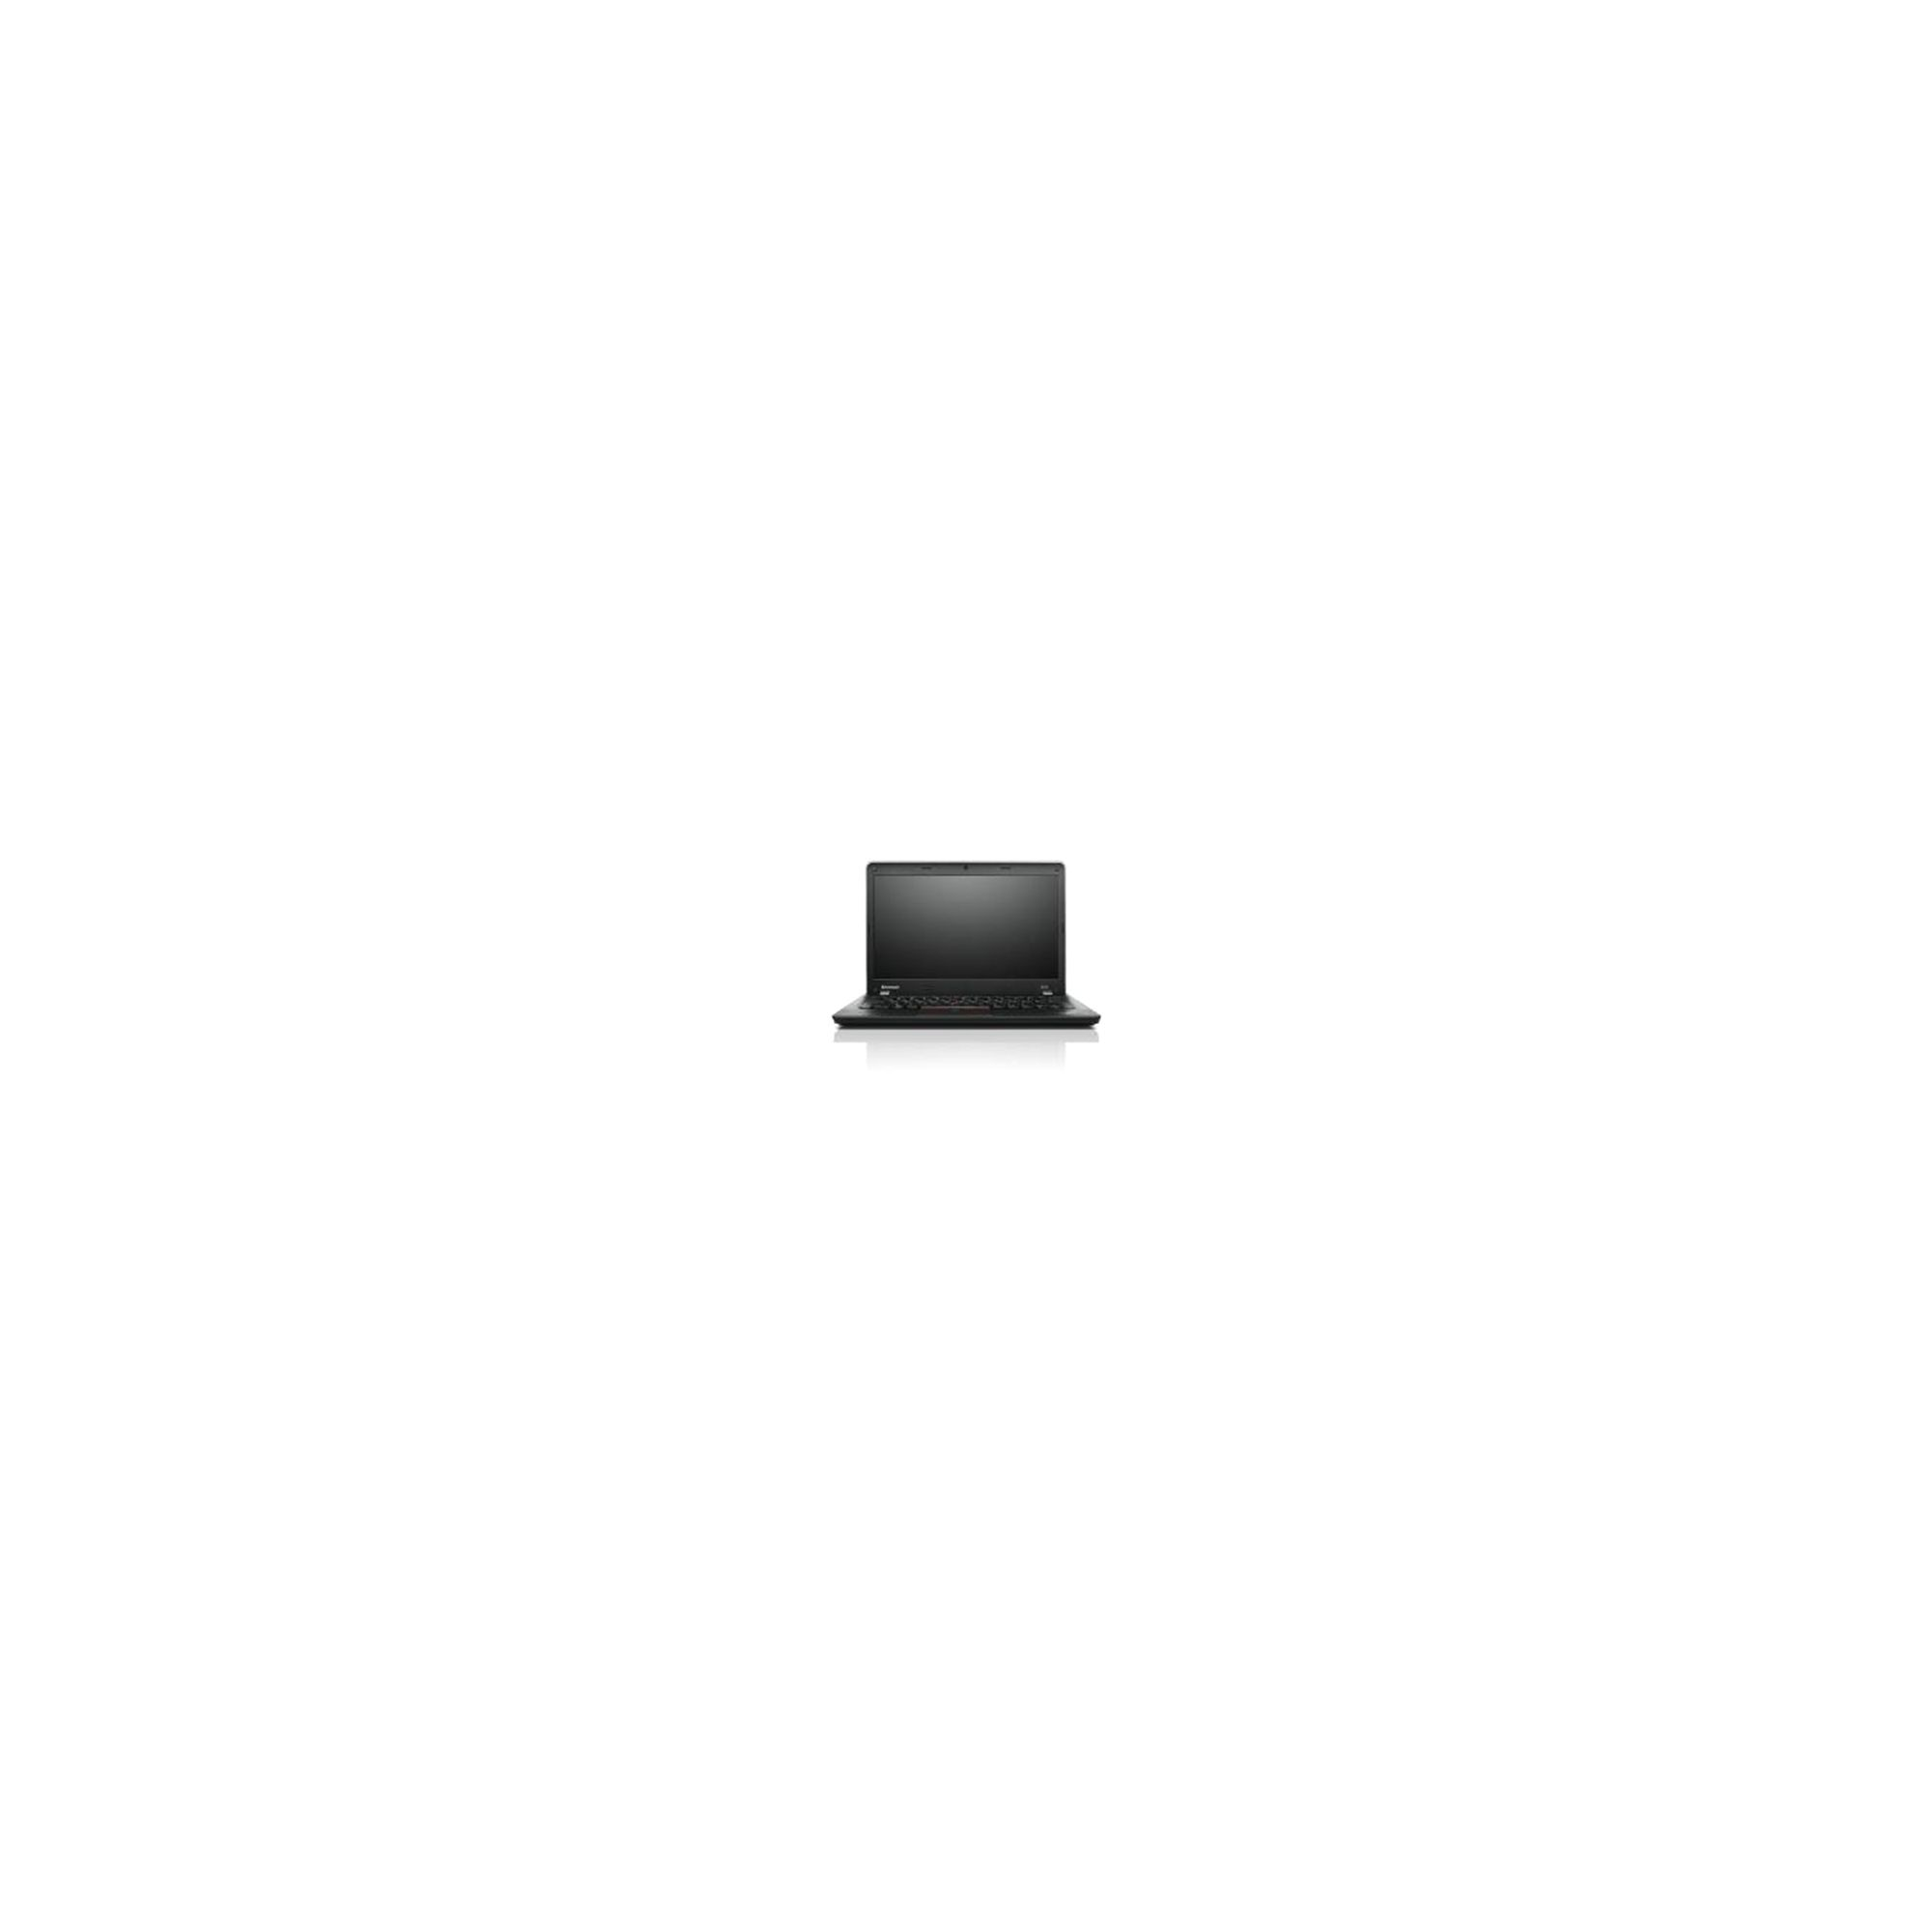 Lenovo ThinkPad Edge E330 3354BJG (13.3 inch) Notebook Core i5 (3210M) 2.5GHz 4GB 500GB WLAN BT Webcam Windows 7 Pro 64-bit/Windows 8 Pro 64-bit RDVD at Tescos Direct